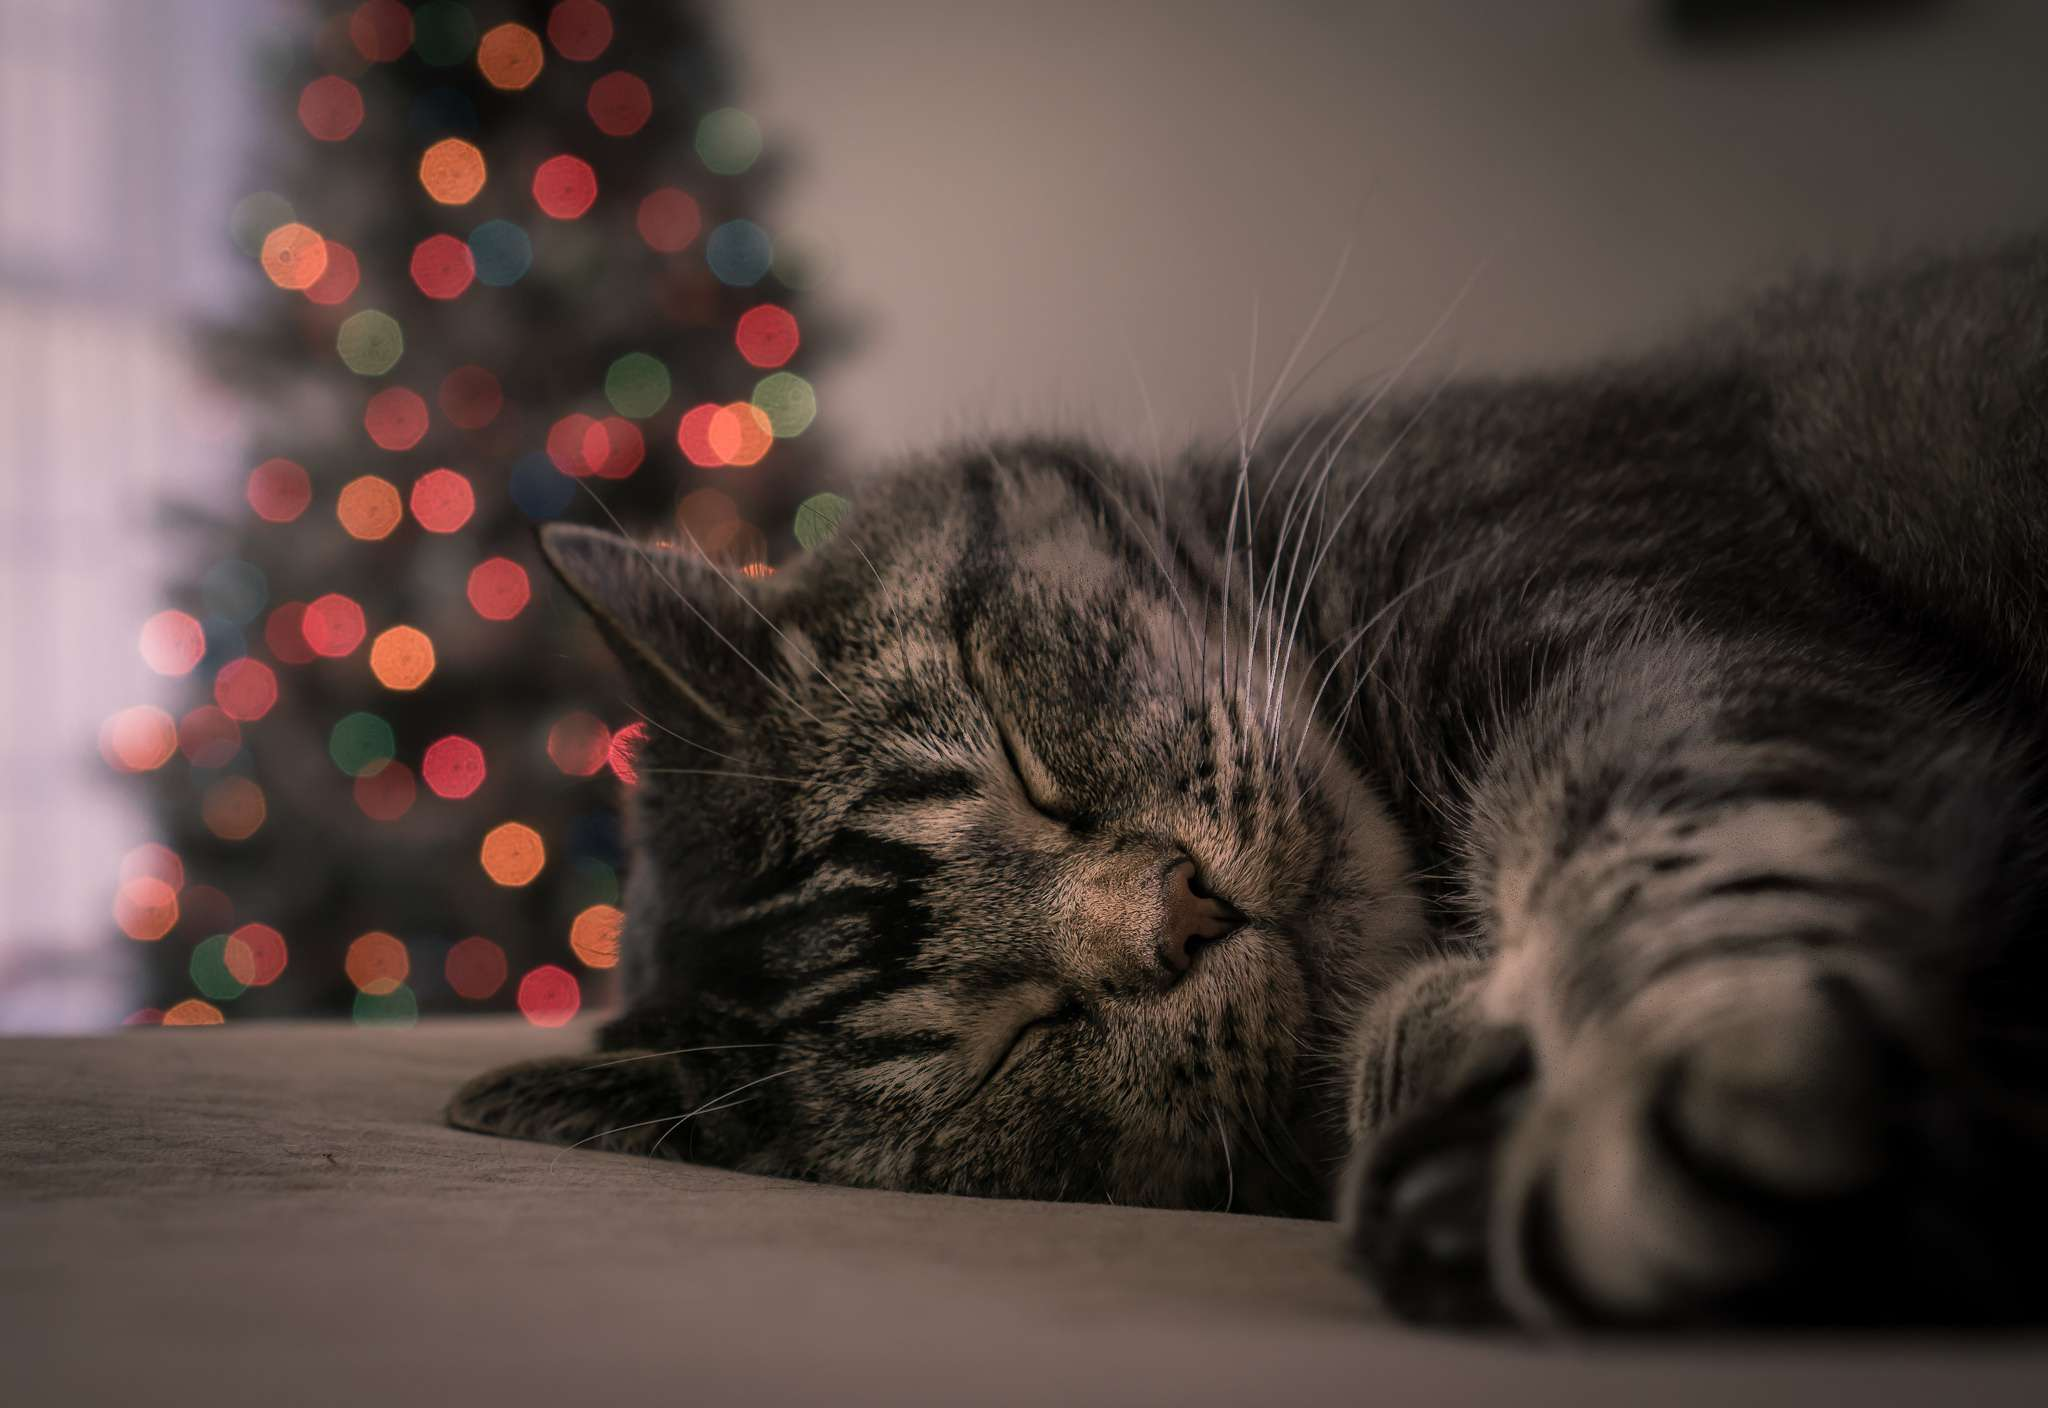 cat sleeping by christmas tree